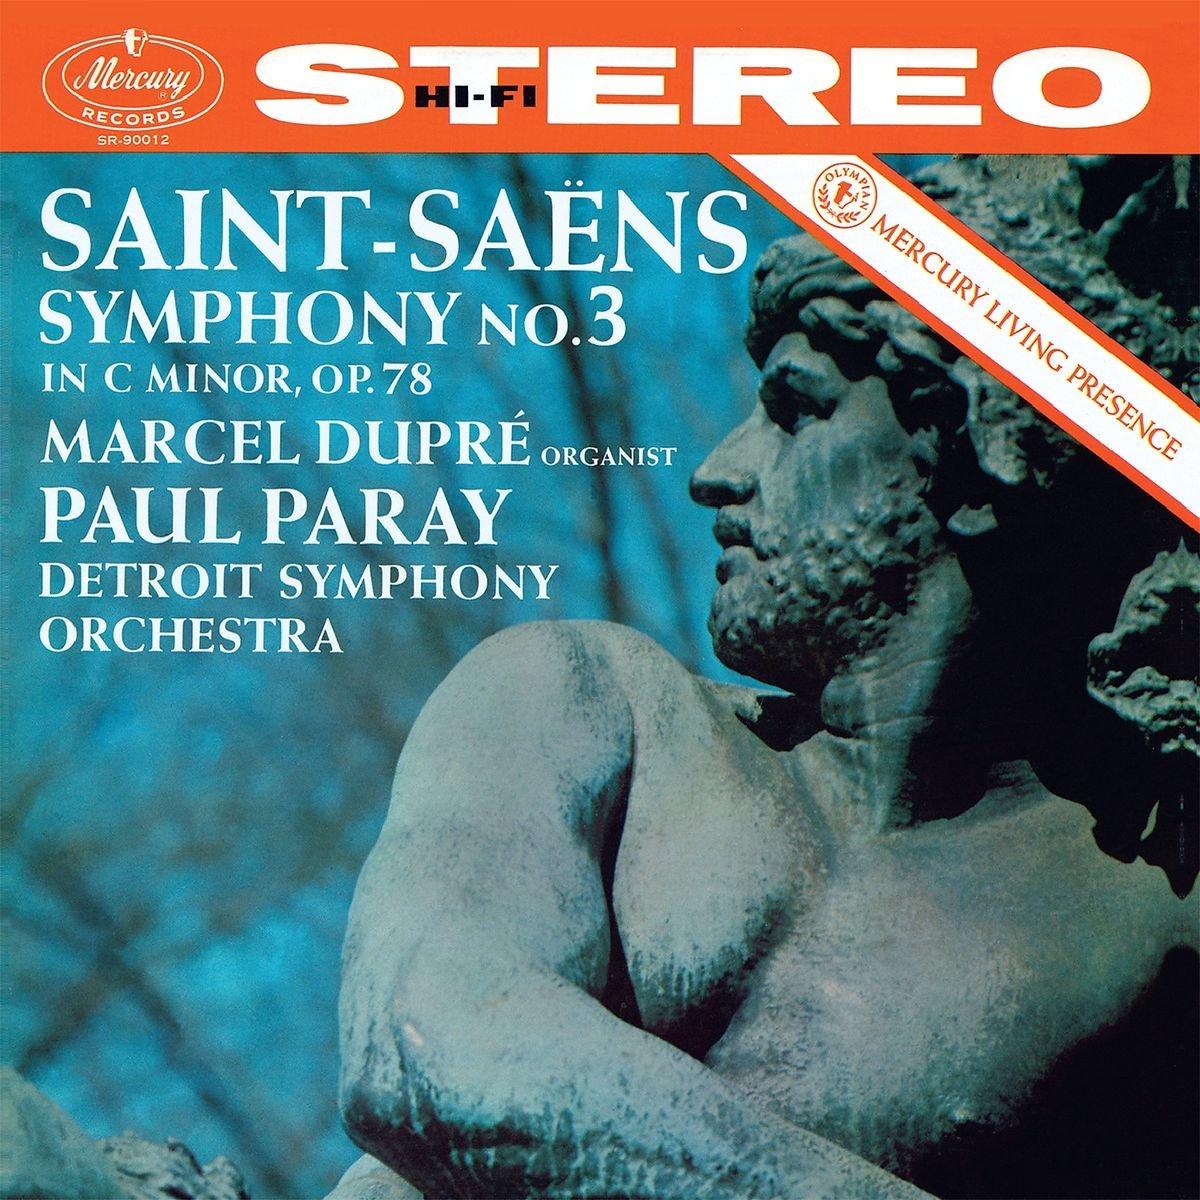 Marcel Dupre. Saint-Saens. Symphony No. 3